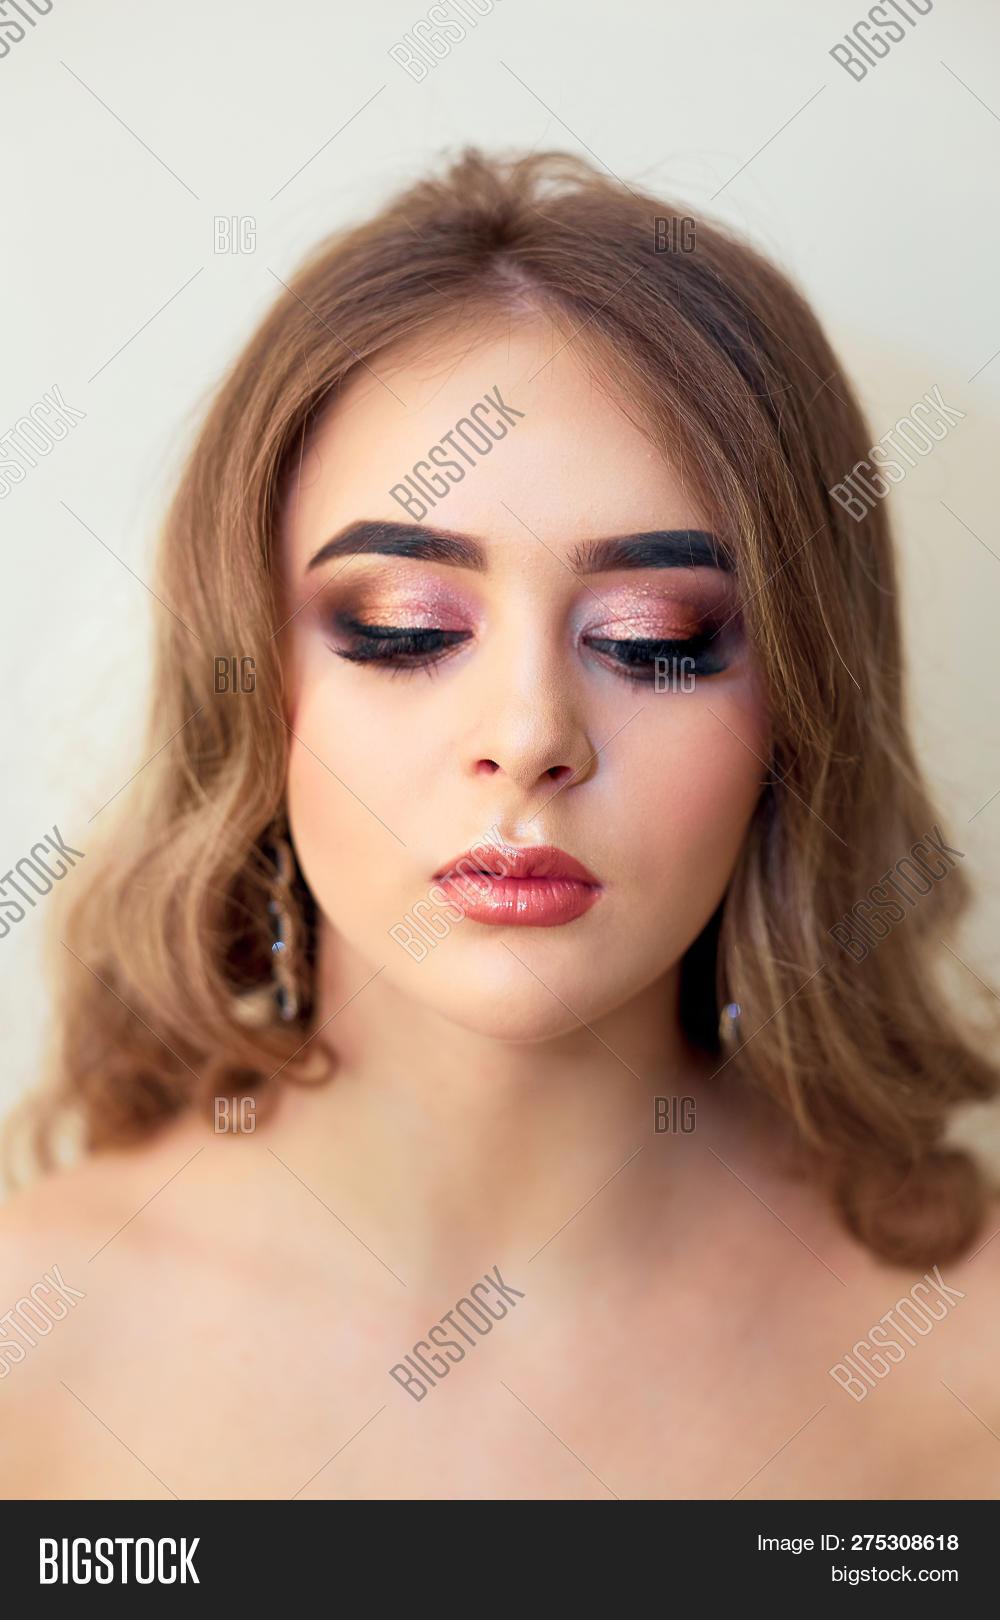 Beautiful Model Girl Image Photo Free Trial Bigstock